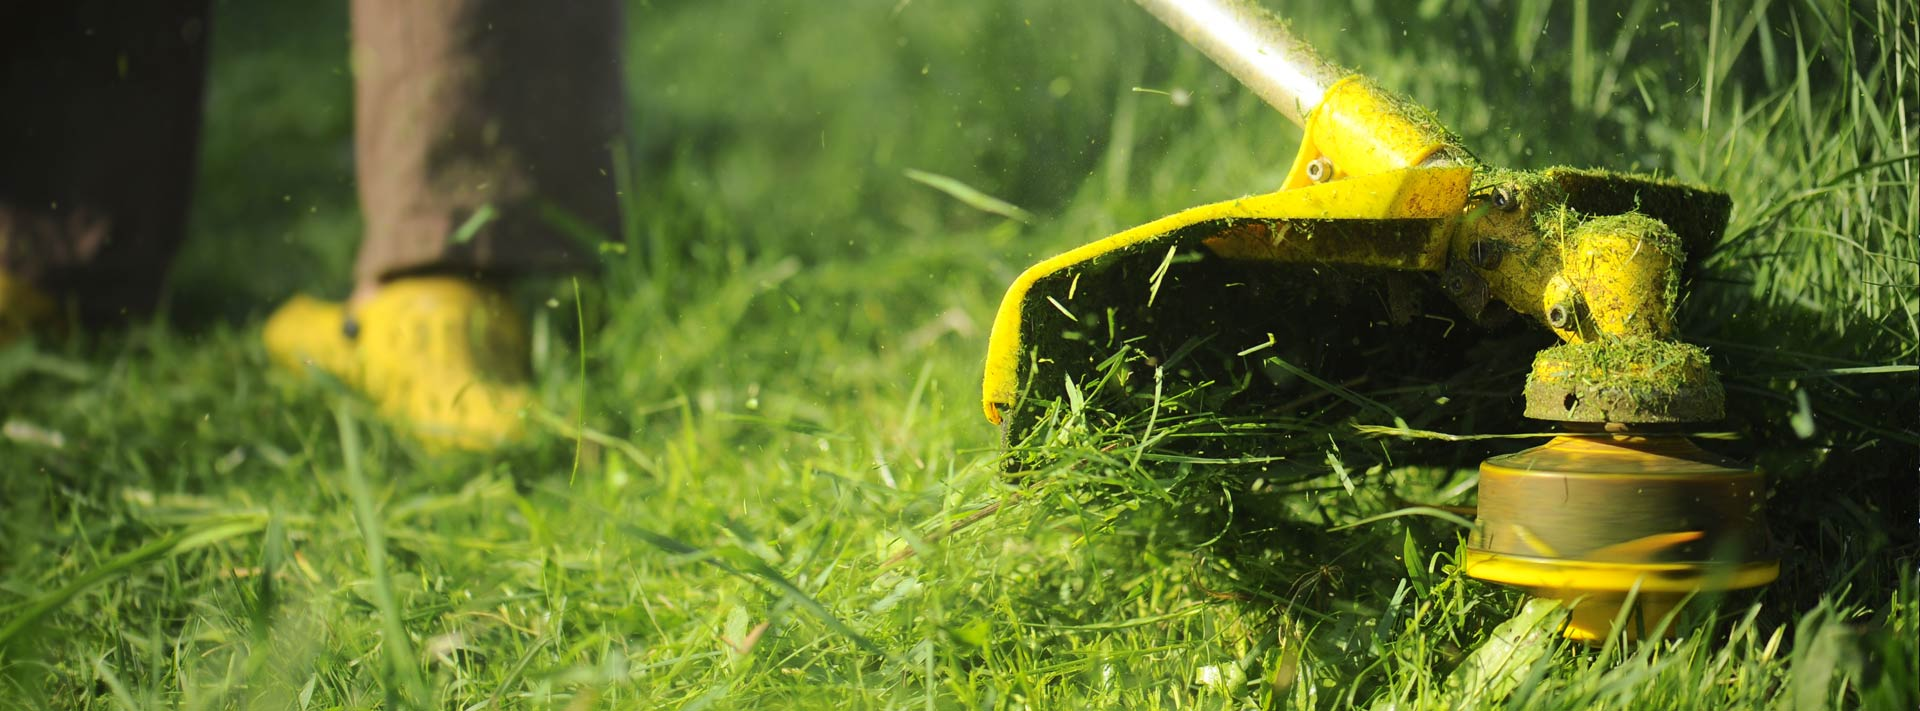 manutenzione-aree-verdi